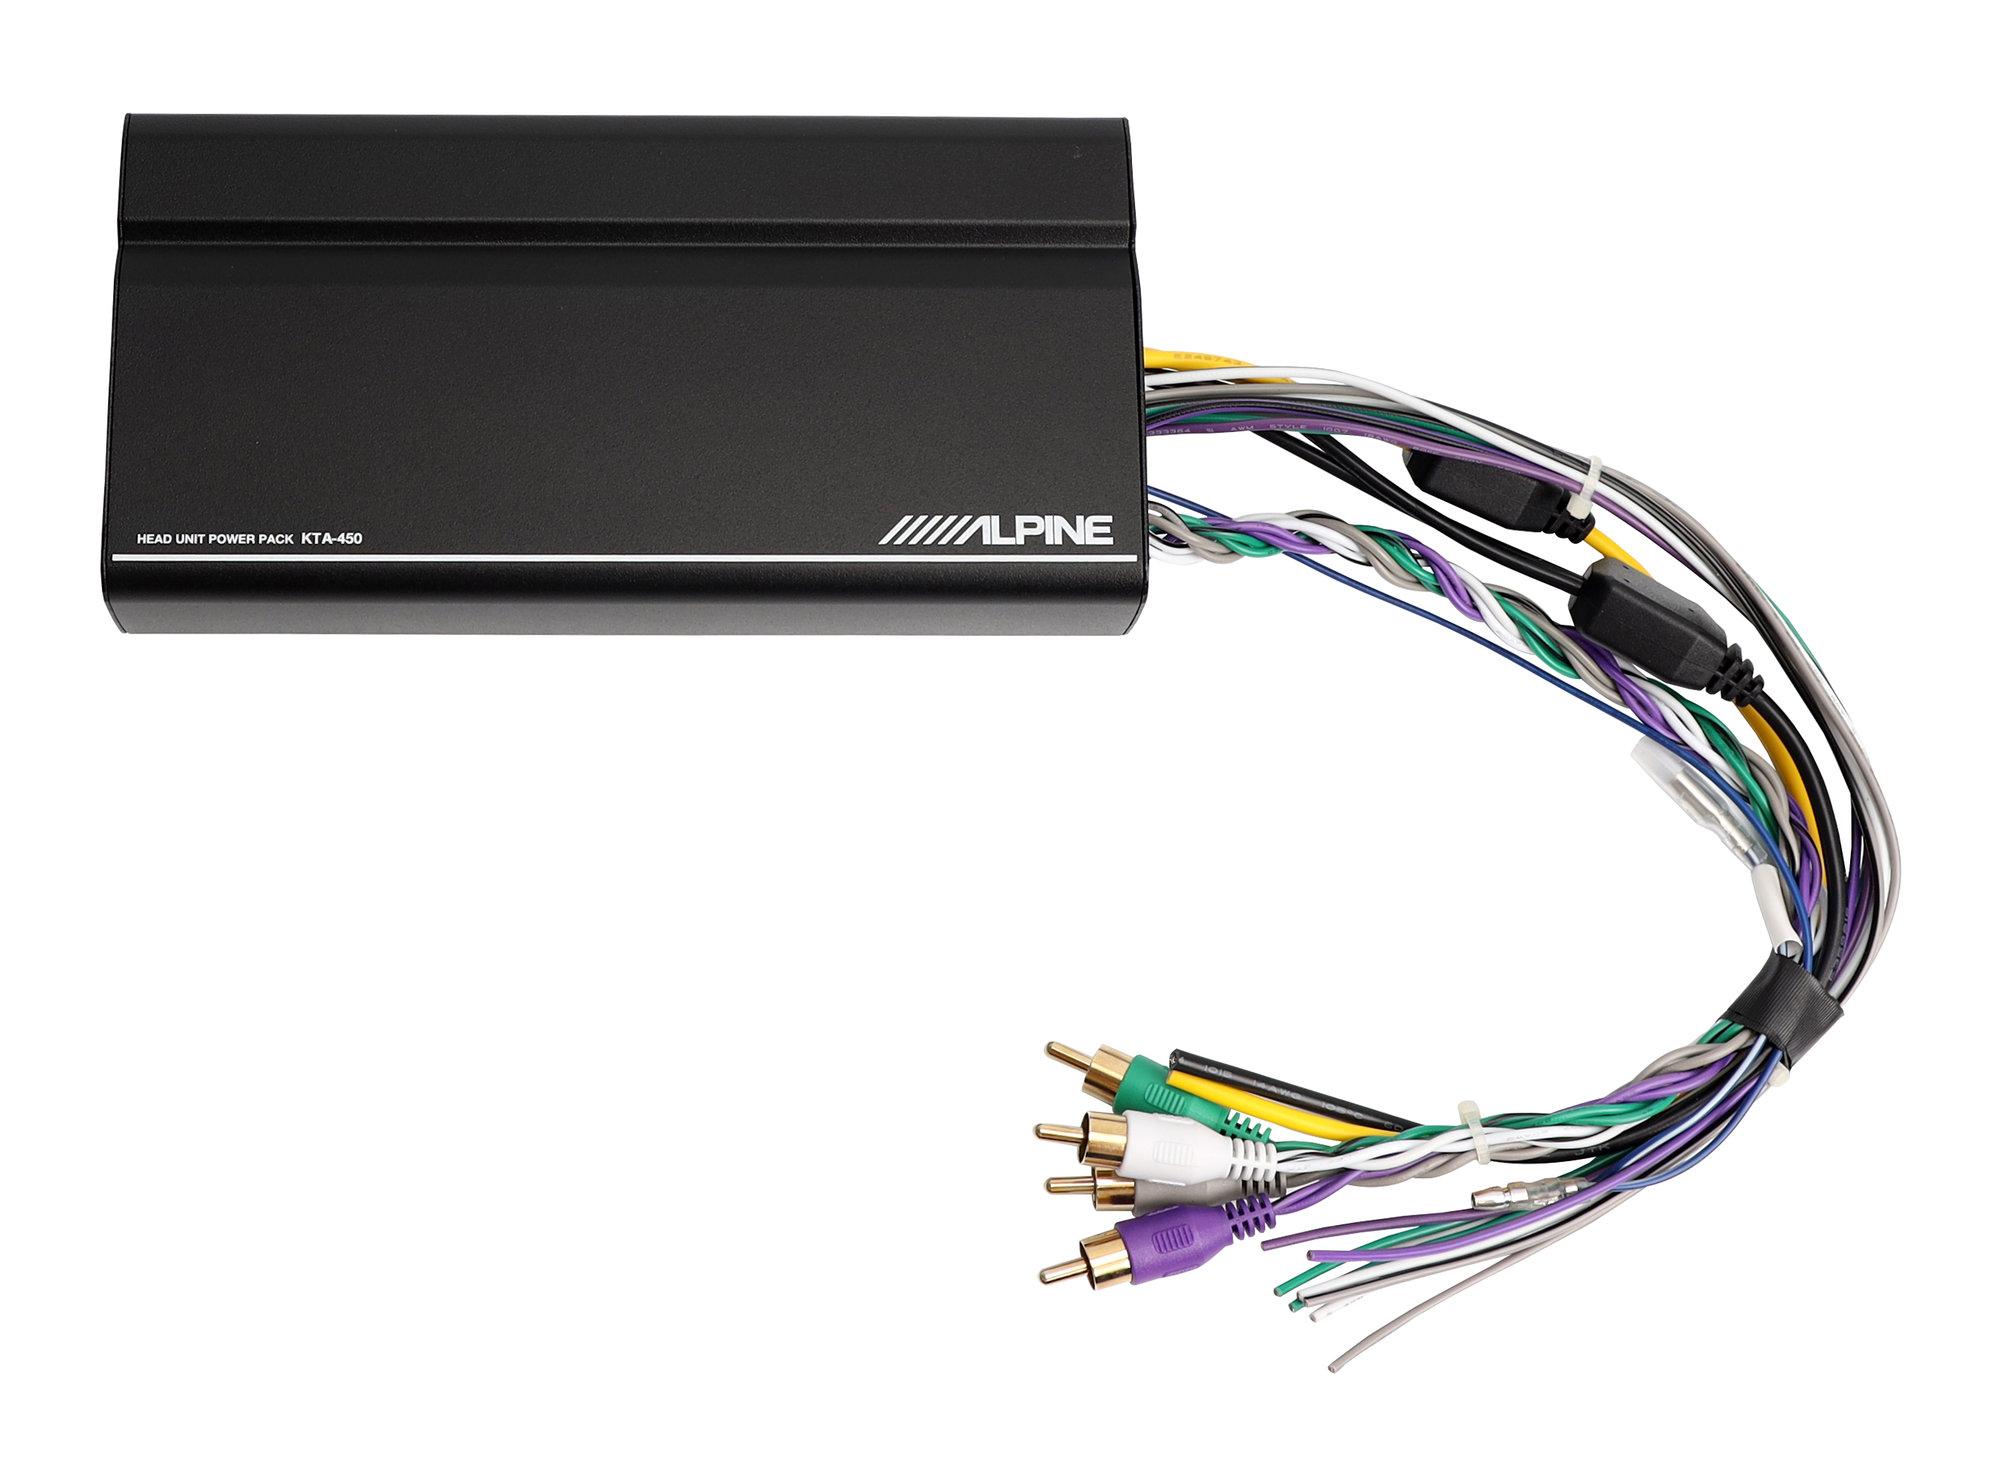 hight resolution of alpine mrp m500 wiring diagram